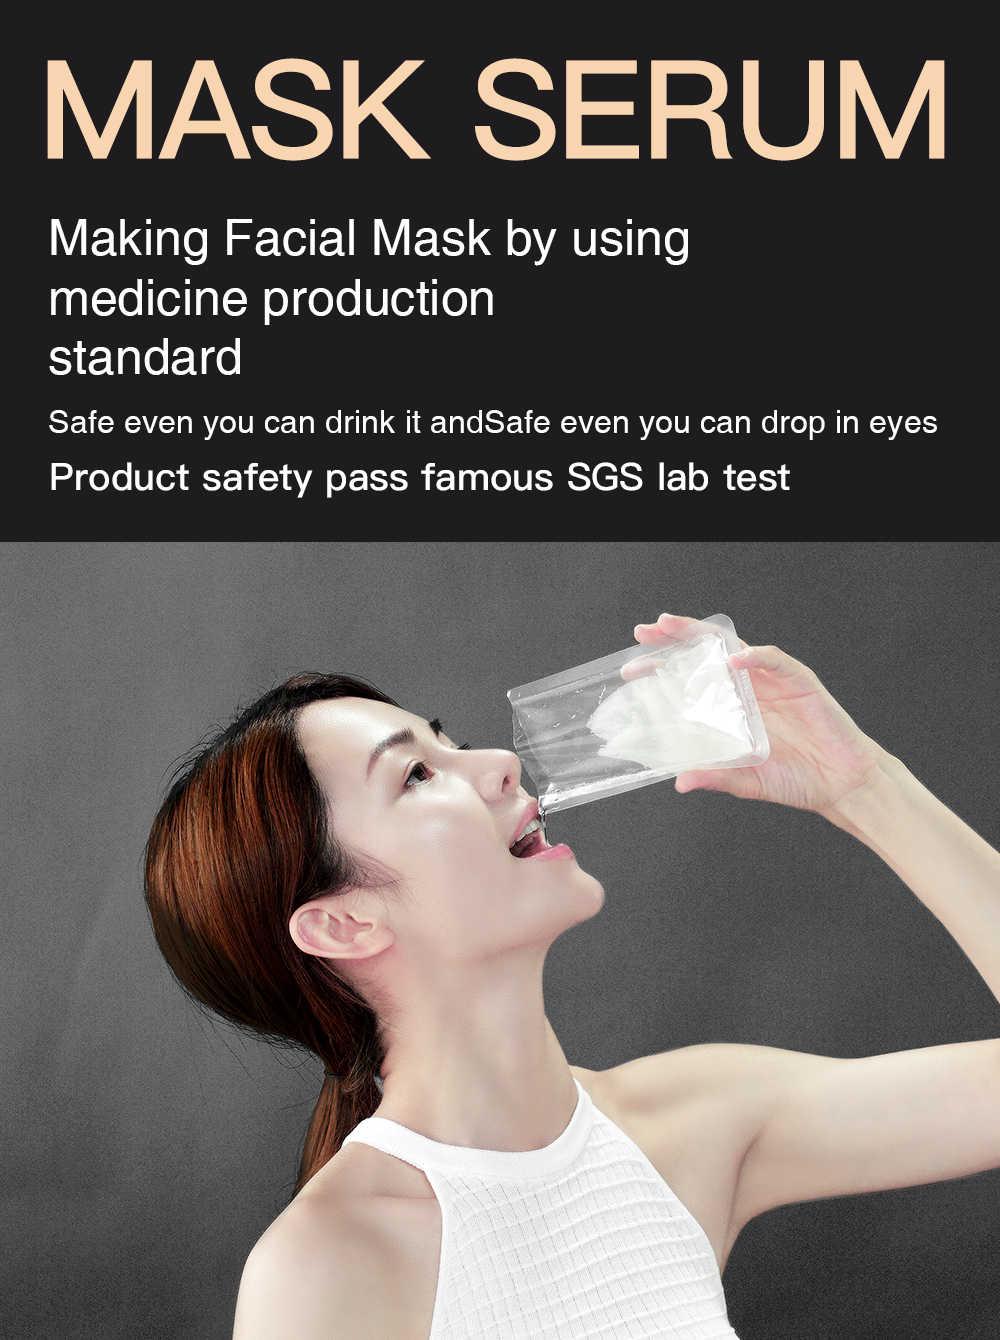 Rosa revitalizante carbón máscara Facial limpiadora hidratante meclor aditivo libre Natural orgánico negro oro cara hoja conjunto